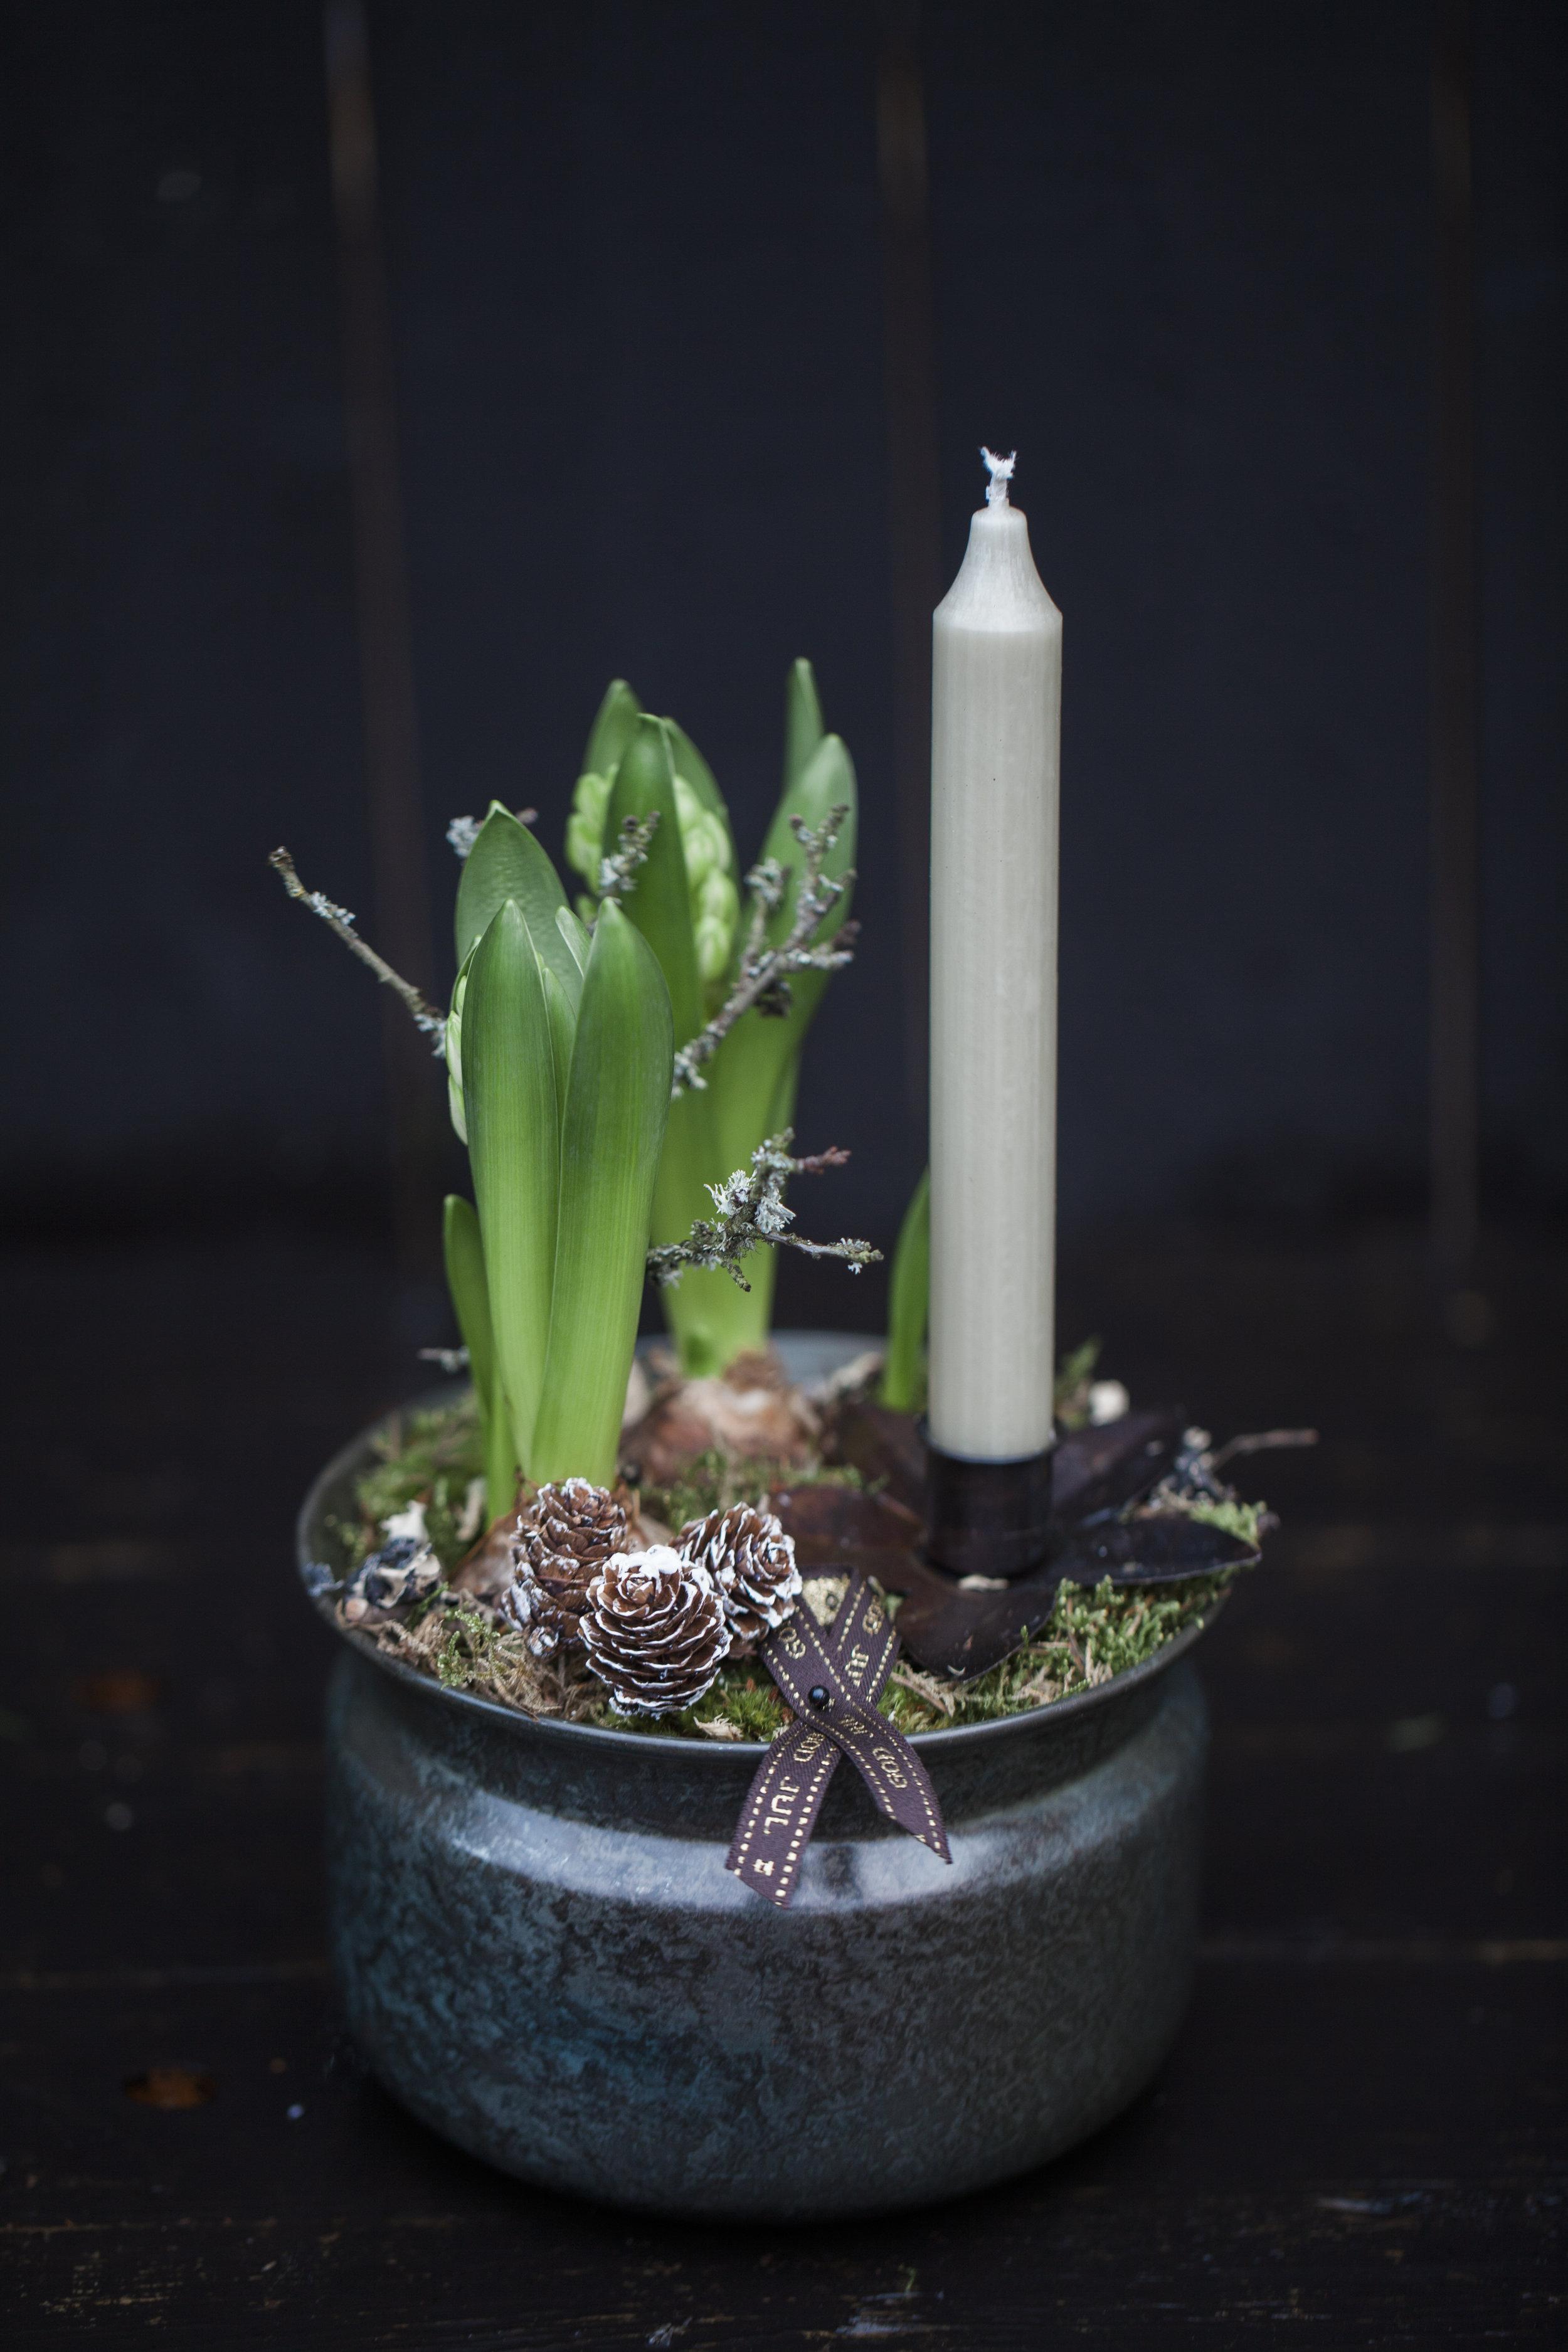 Hyacint m ljus 199:-